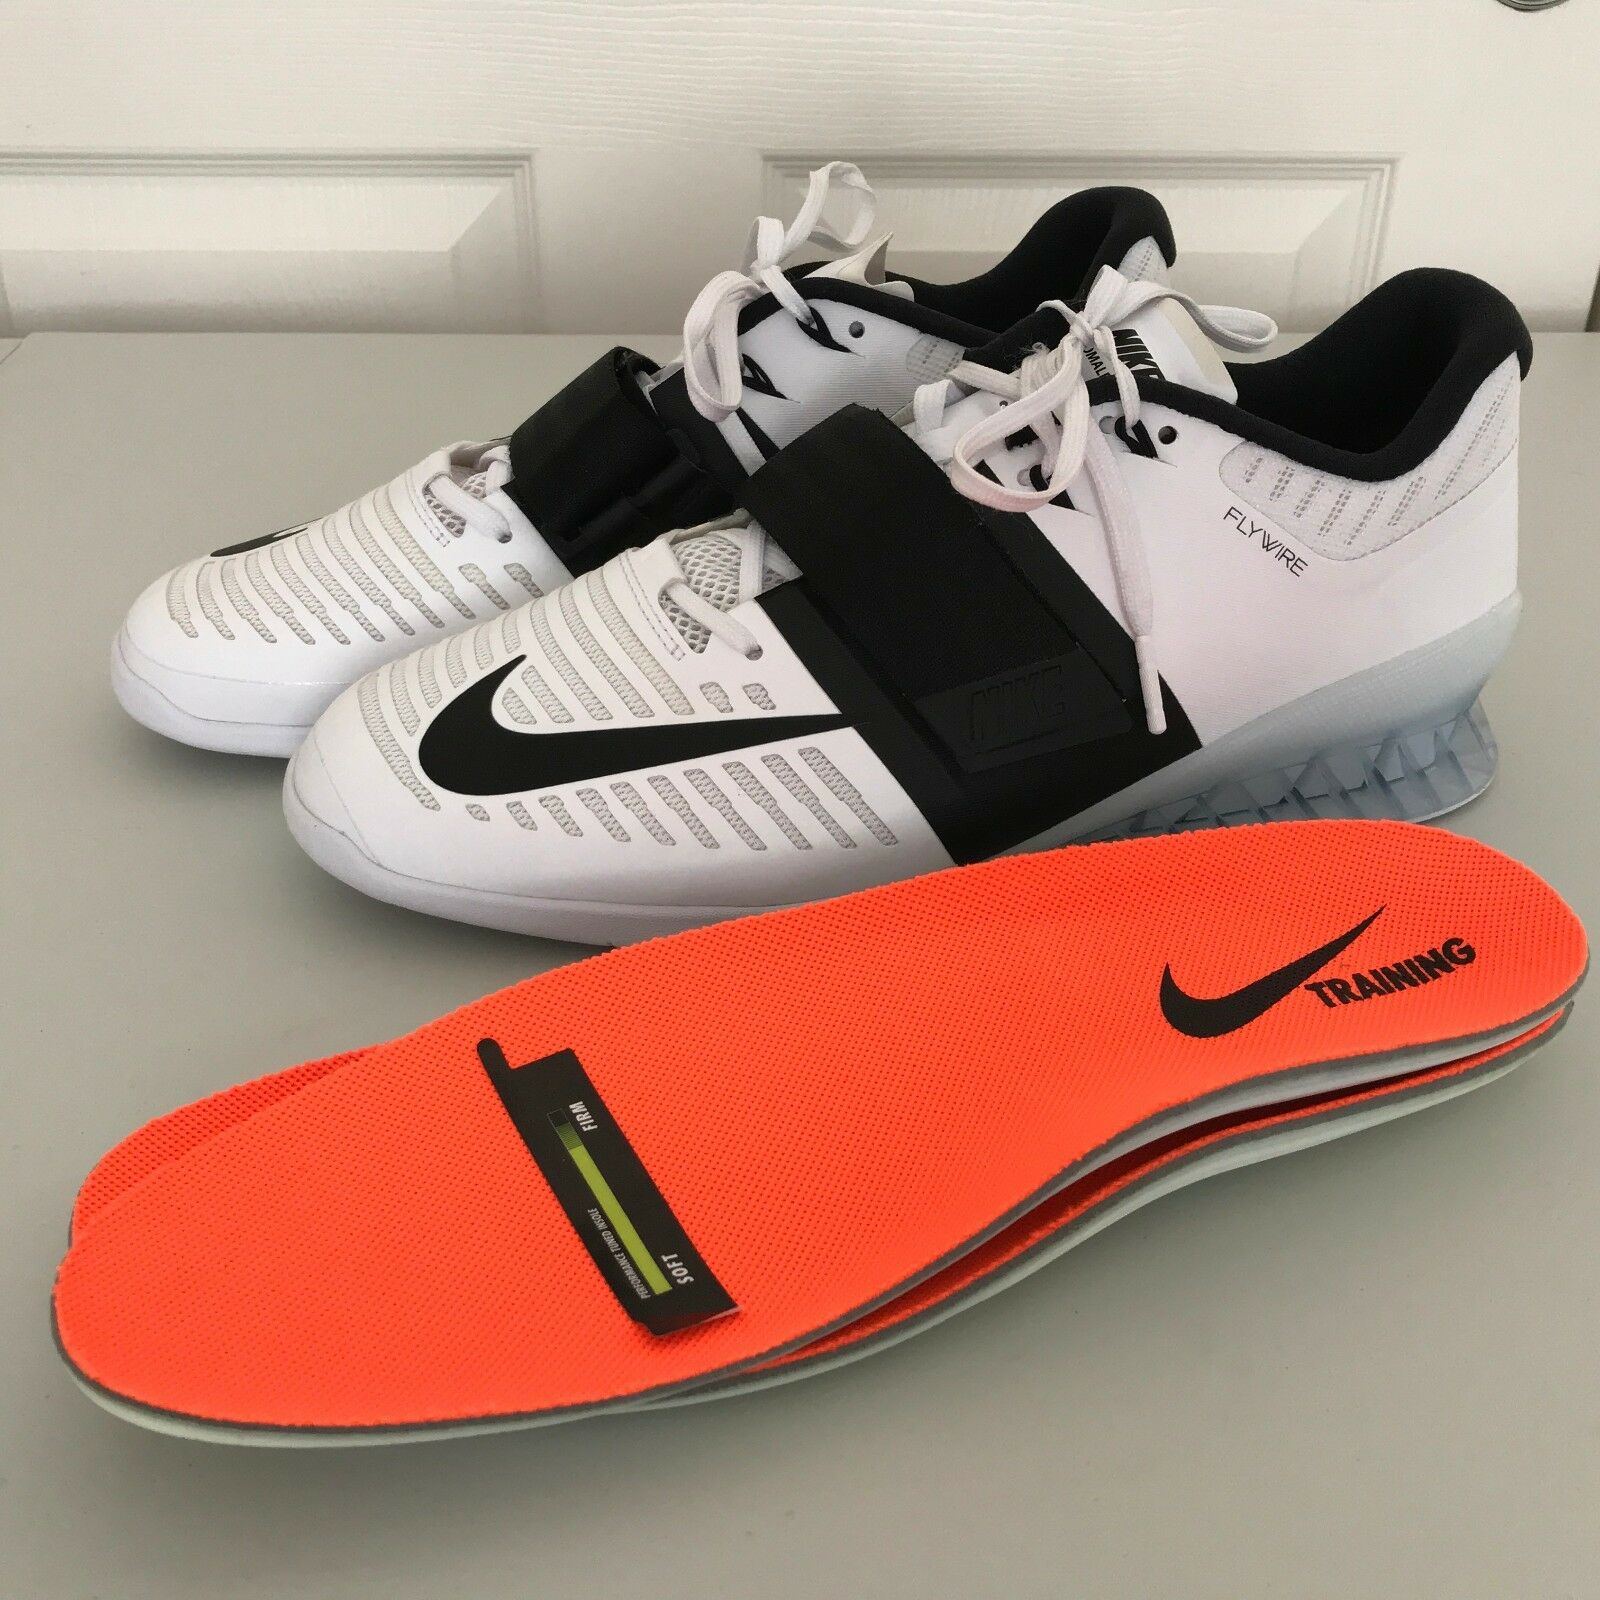 Nike Romaleos  3 bianca nero Weightlifting Training scarpe 852933 -101 Mens Sz 12.5  sconto di vendita